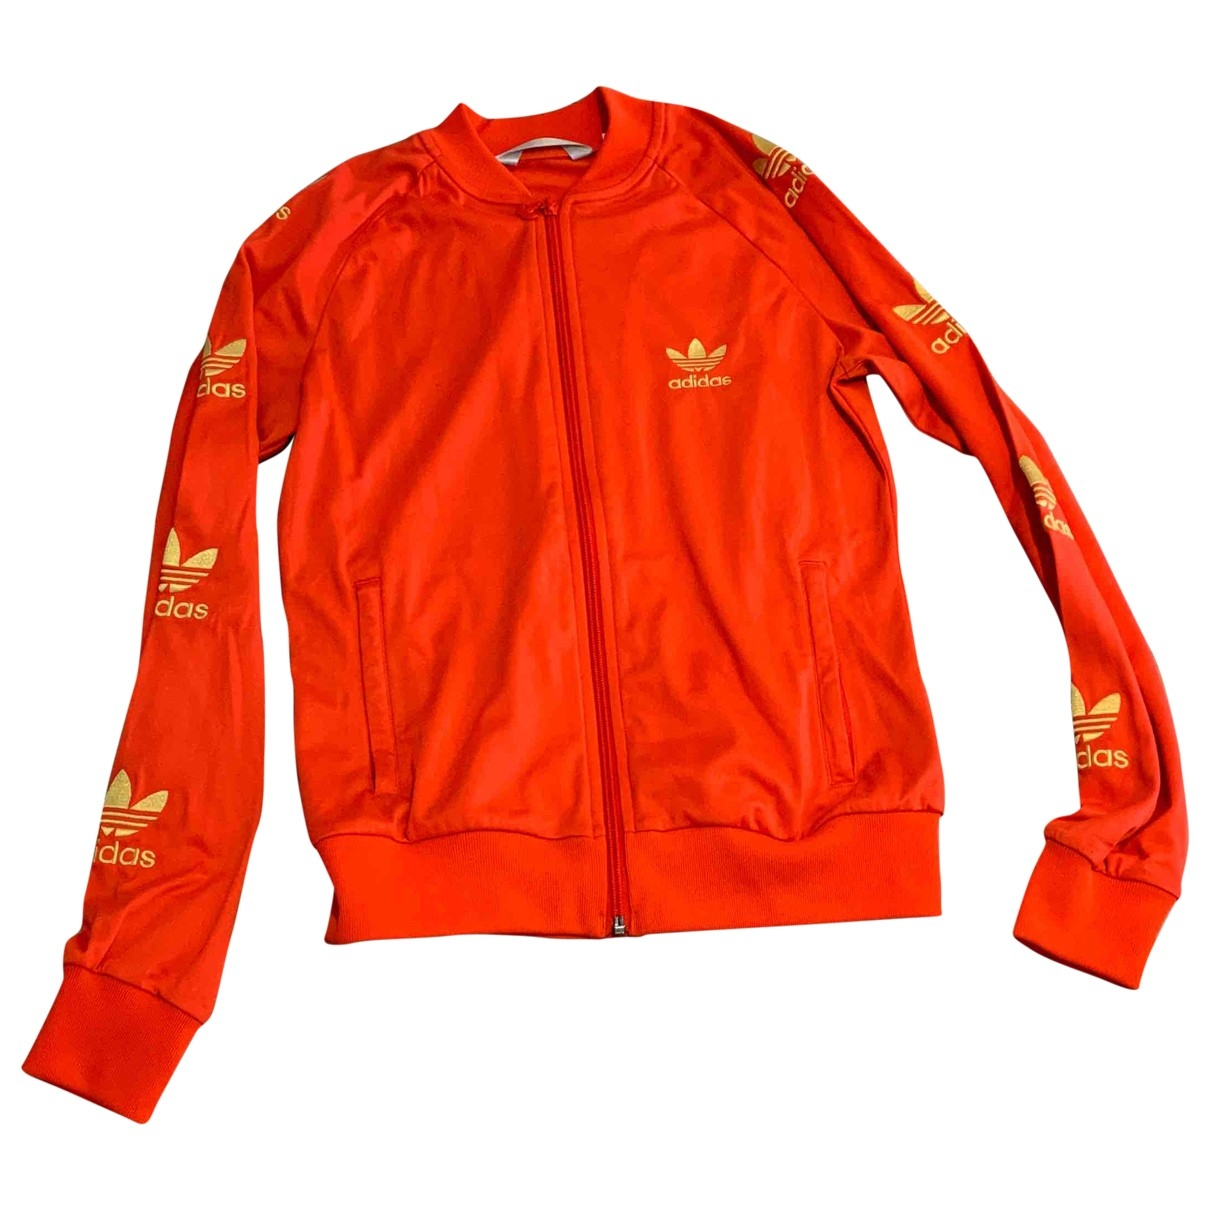 Adidas \N Jacke in  Orange Polyester